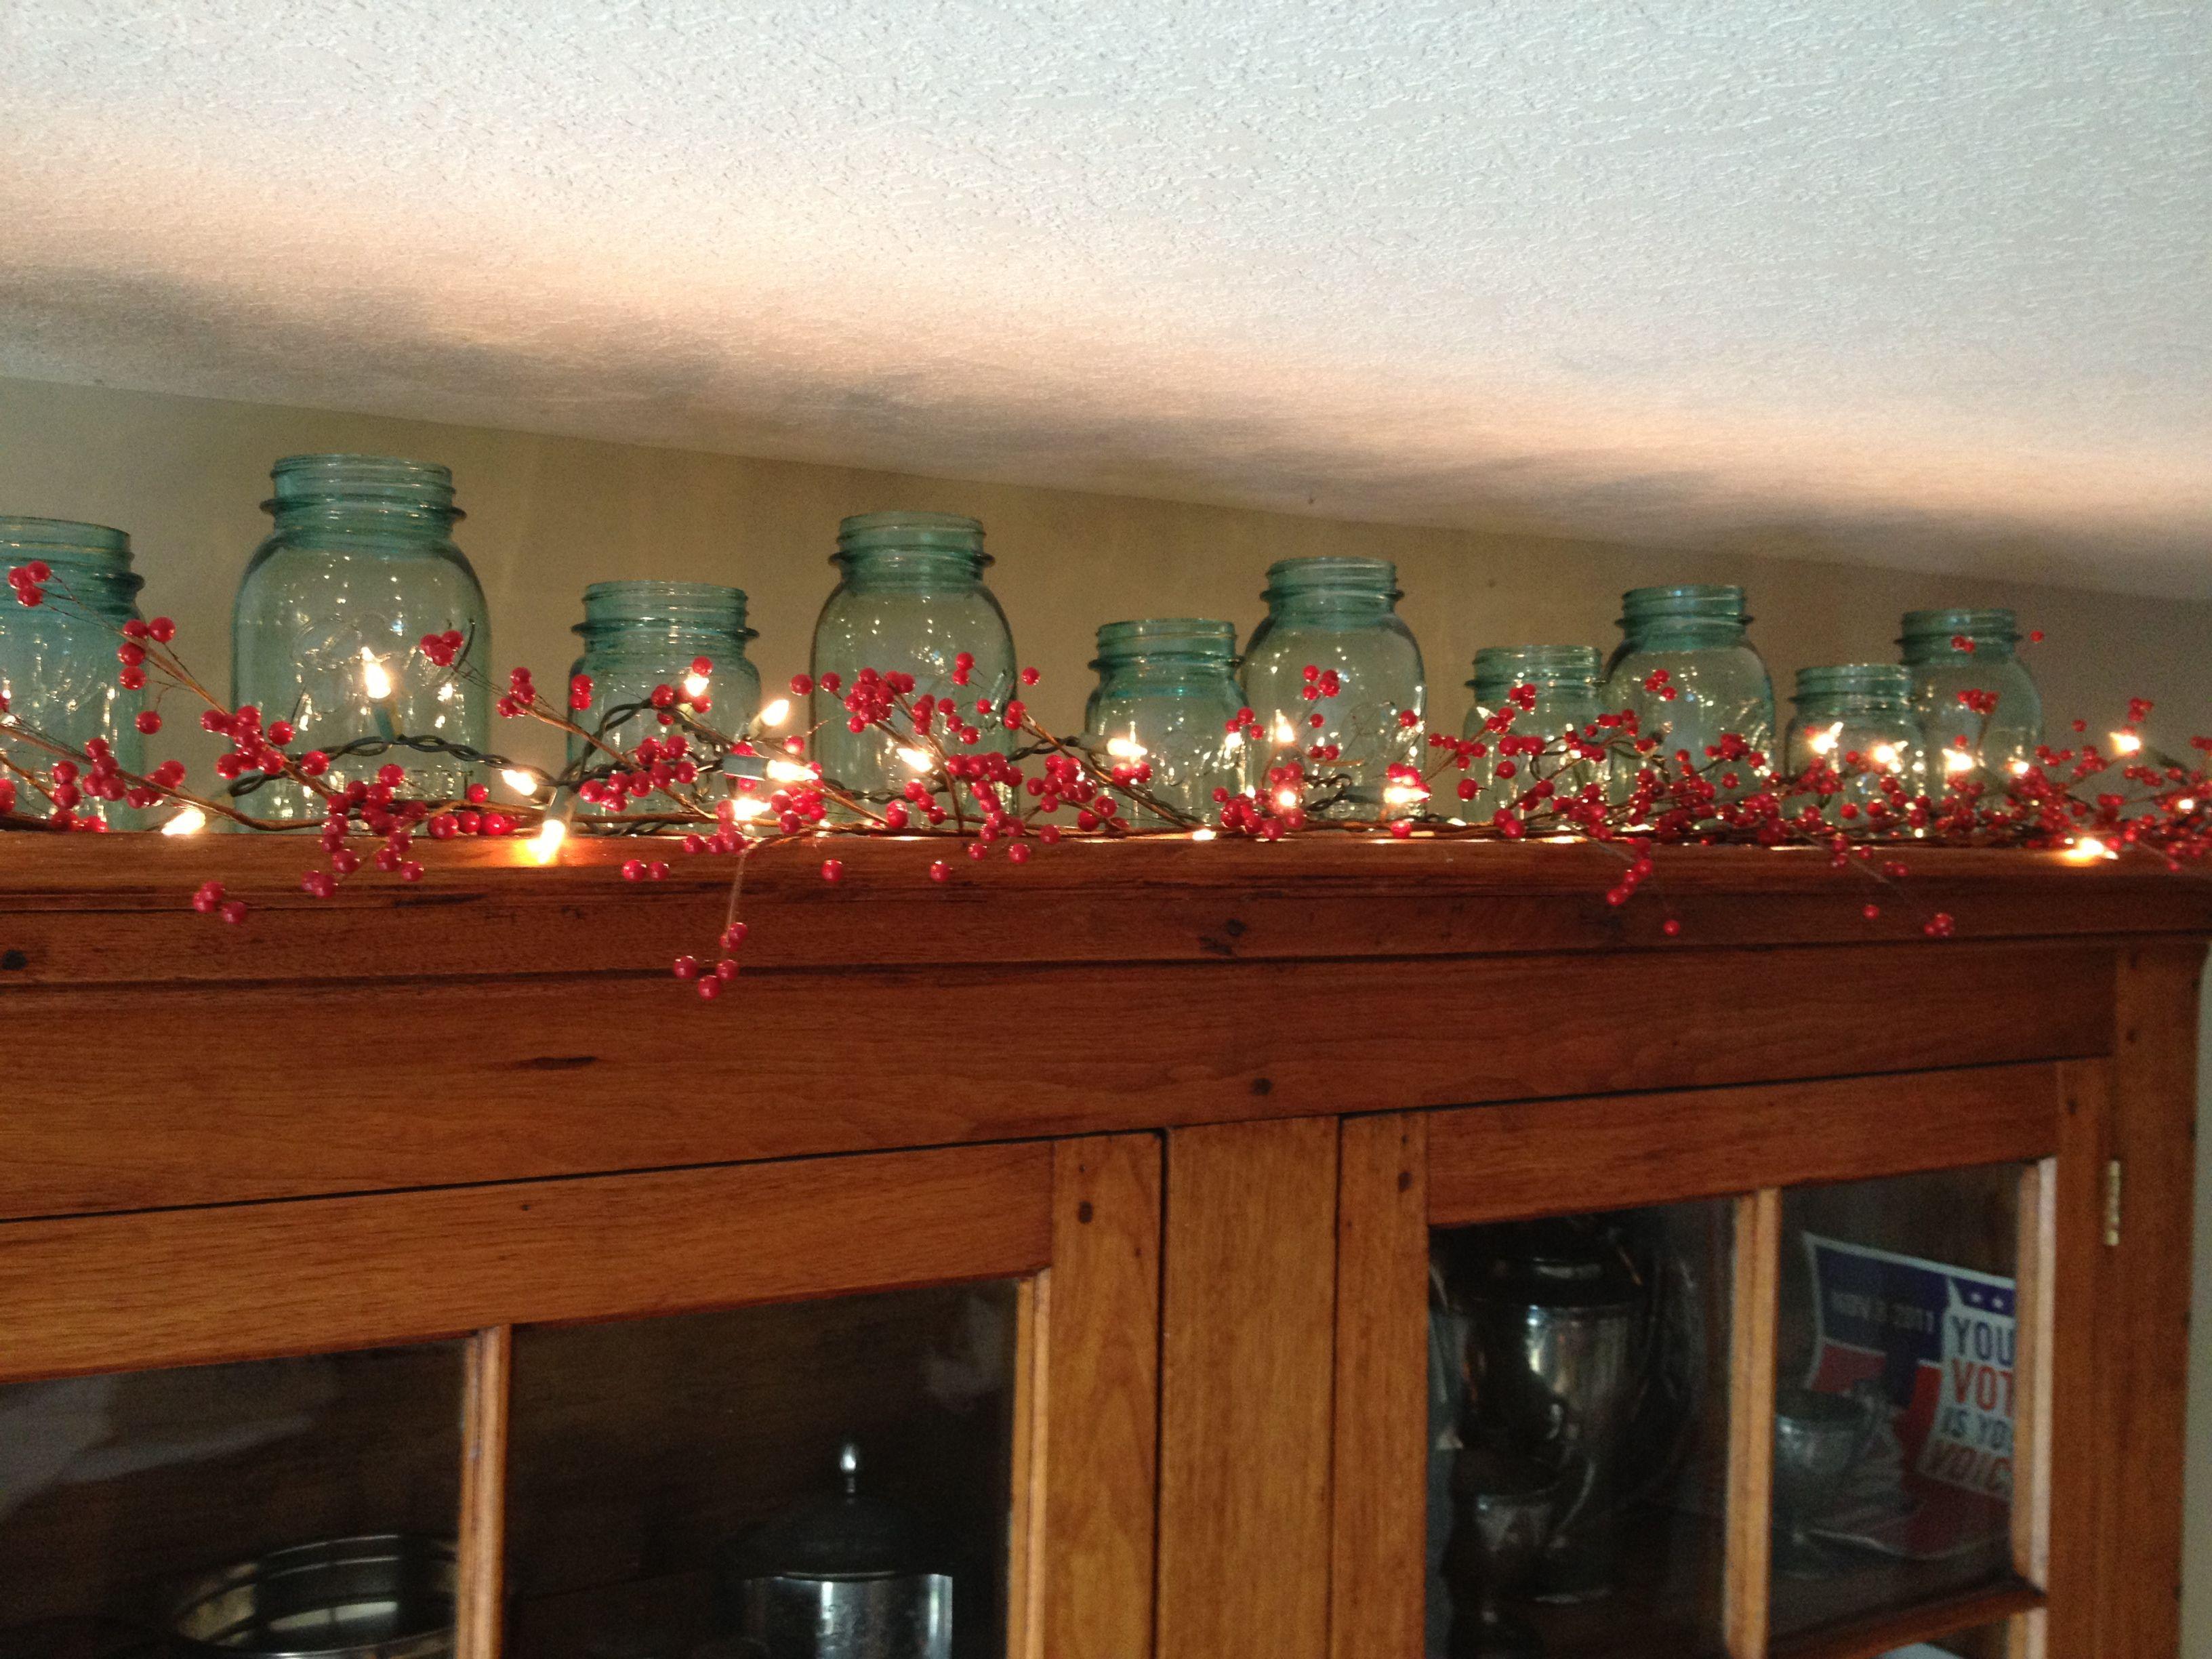 DEOCRATING WITH MASON JARS  Decorating With Mason Jars